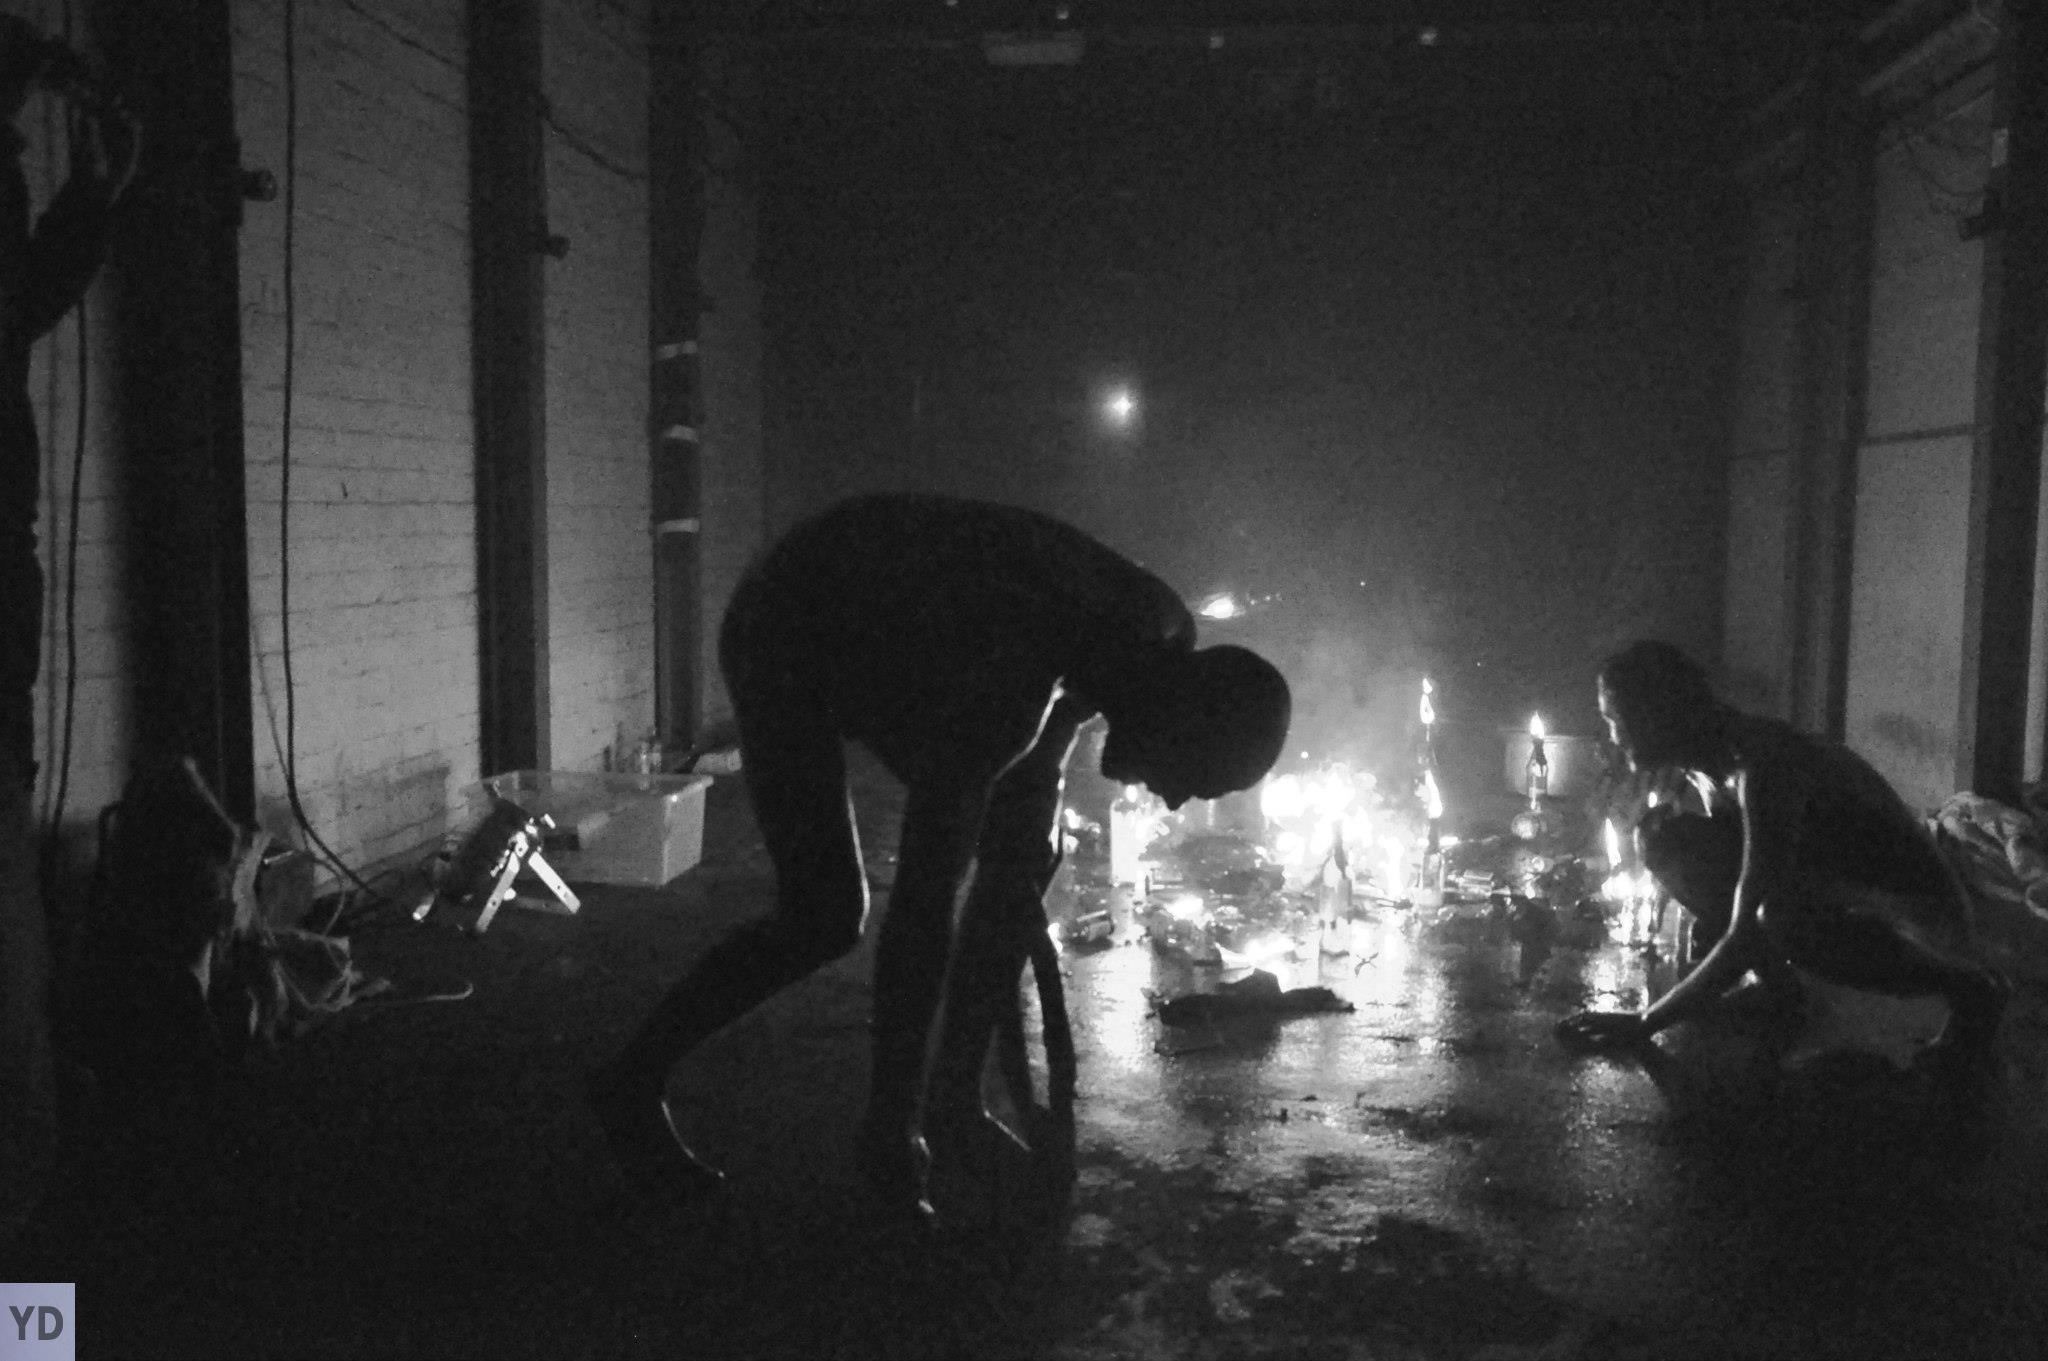 Artist Thomas Bresolin, performing at Tempting Failure 2013, Photo by Yiota Demetriou